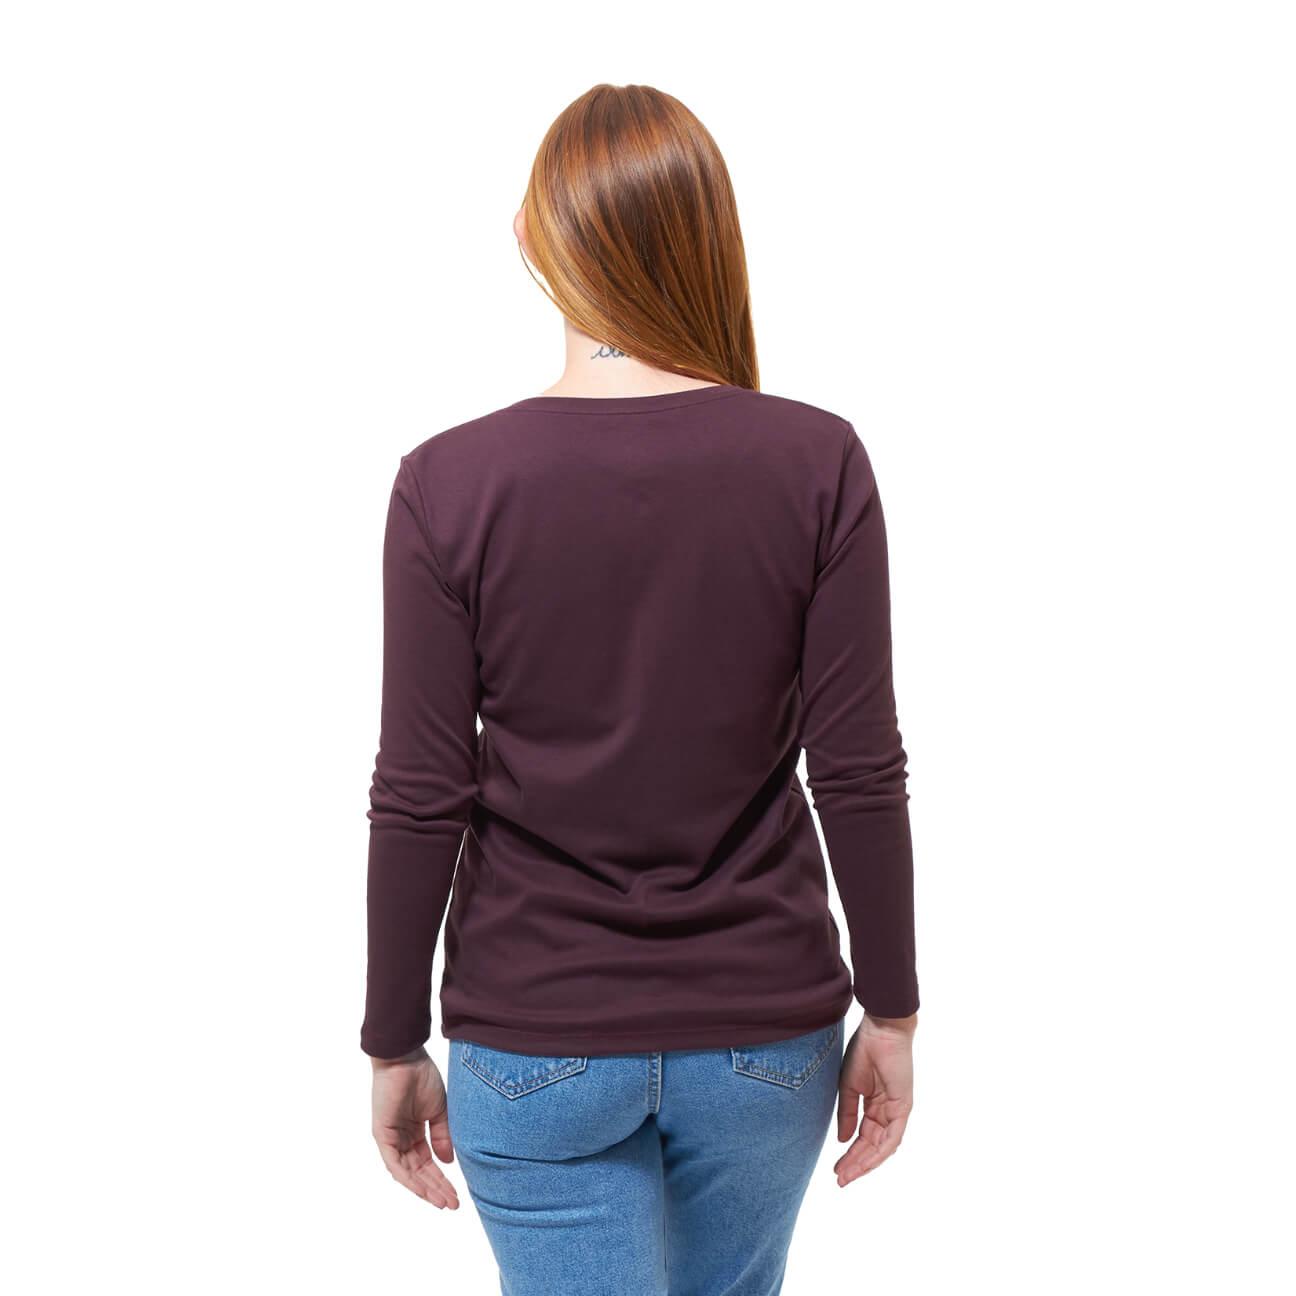 Franela basica dama manga larga vino tinto espalda